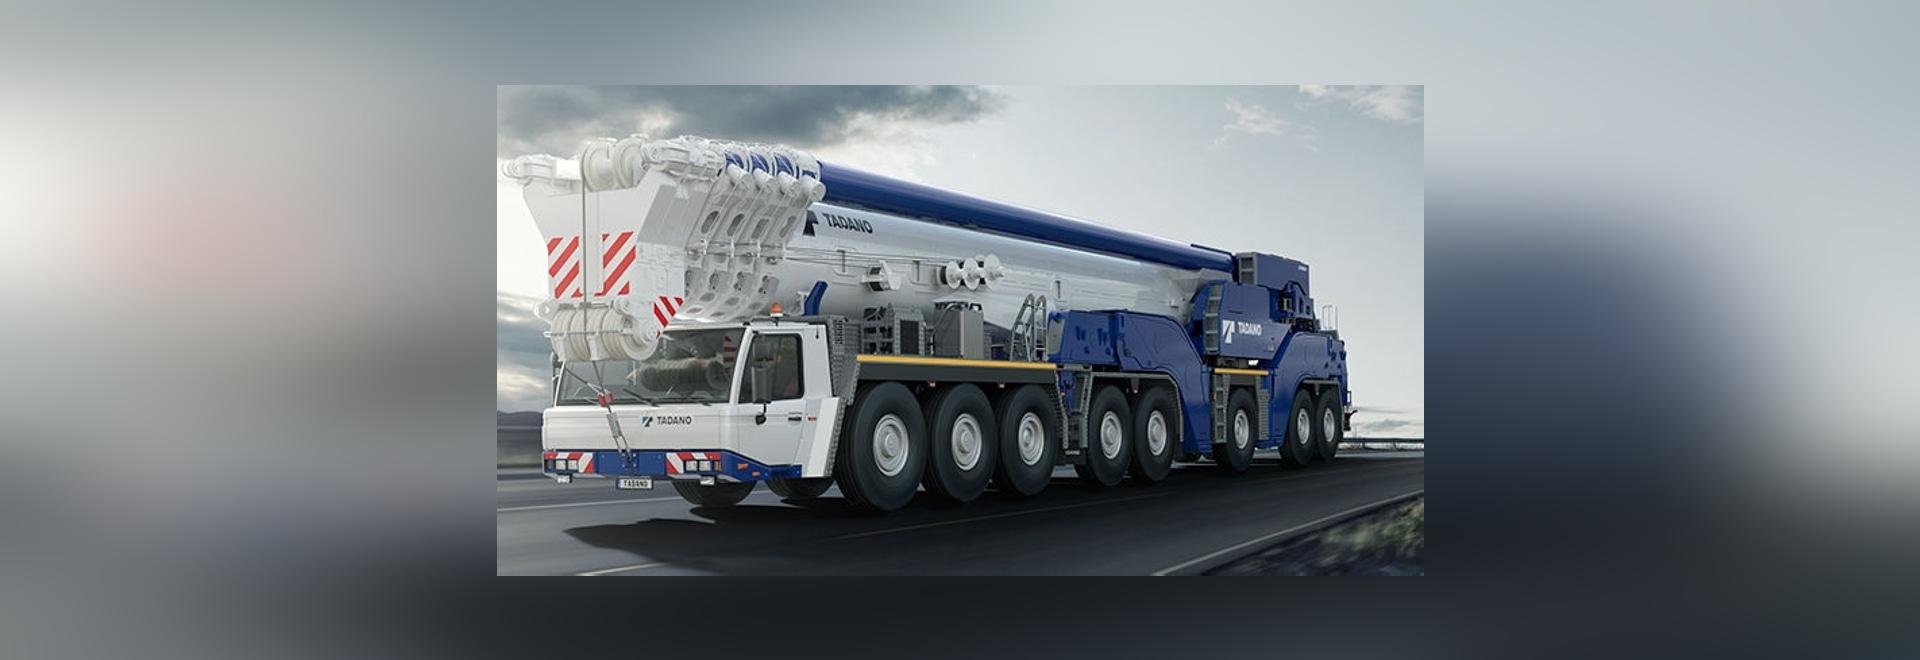 NEW: telescopic crane by TADANO FAUN - TADANO FAUN